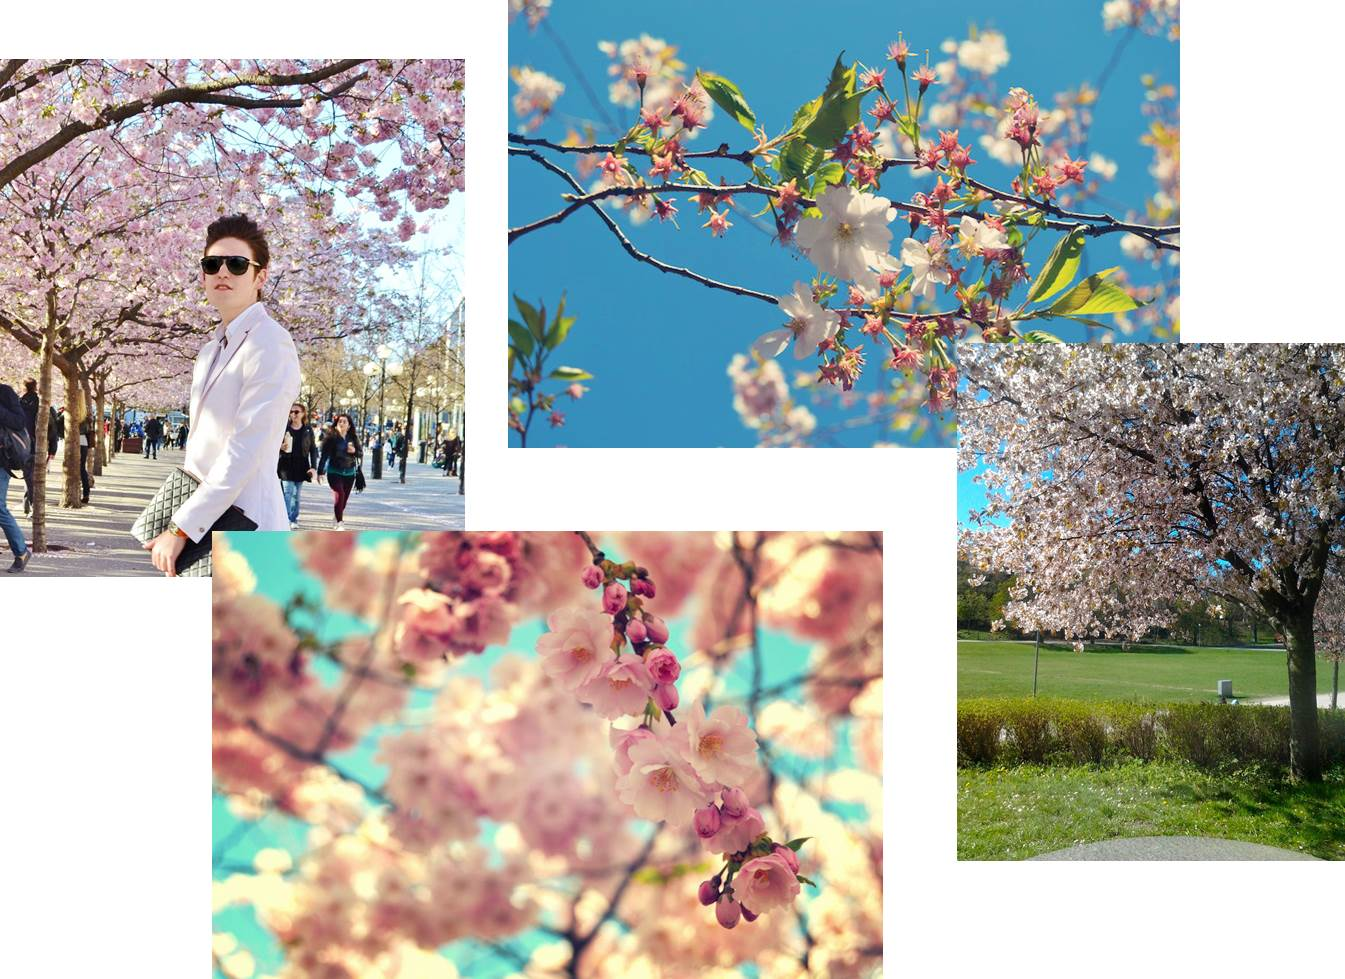 kirsikankukka.jpg